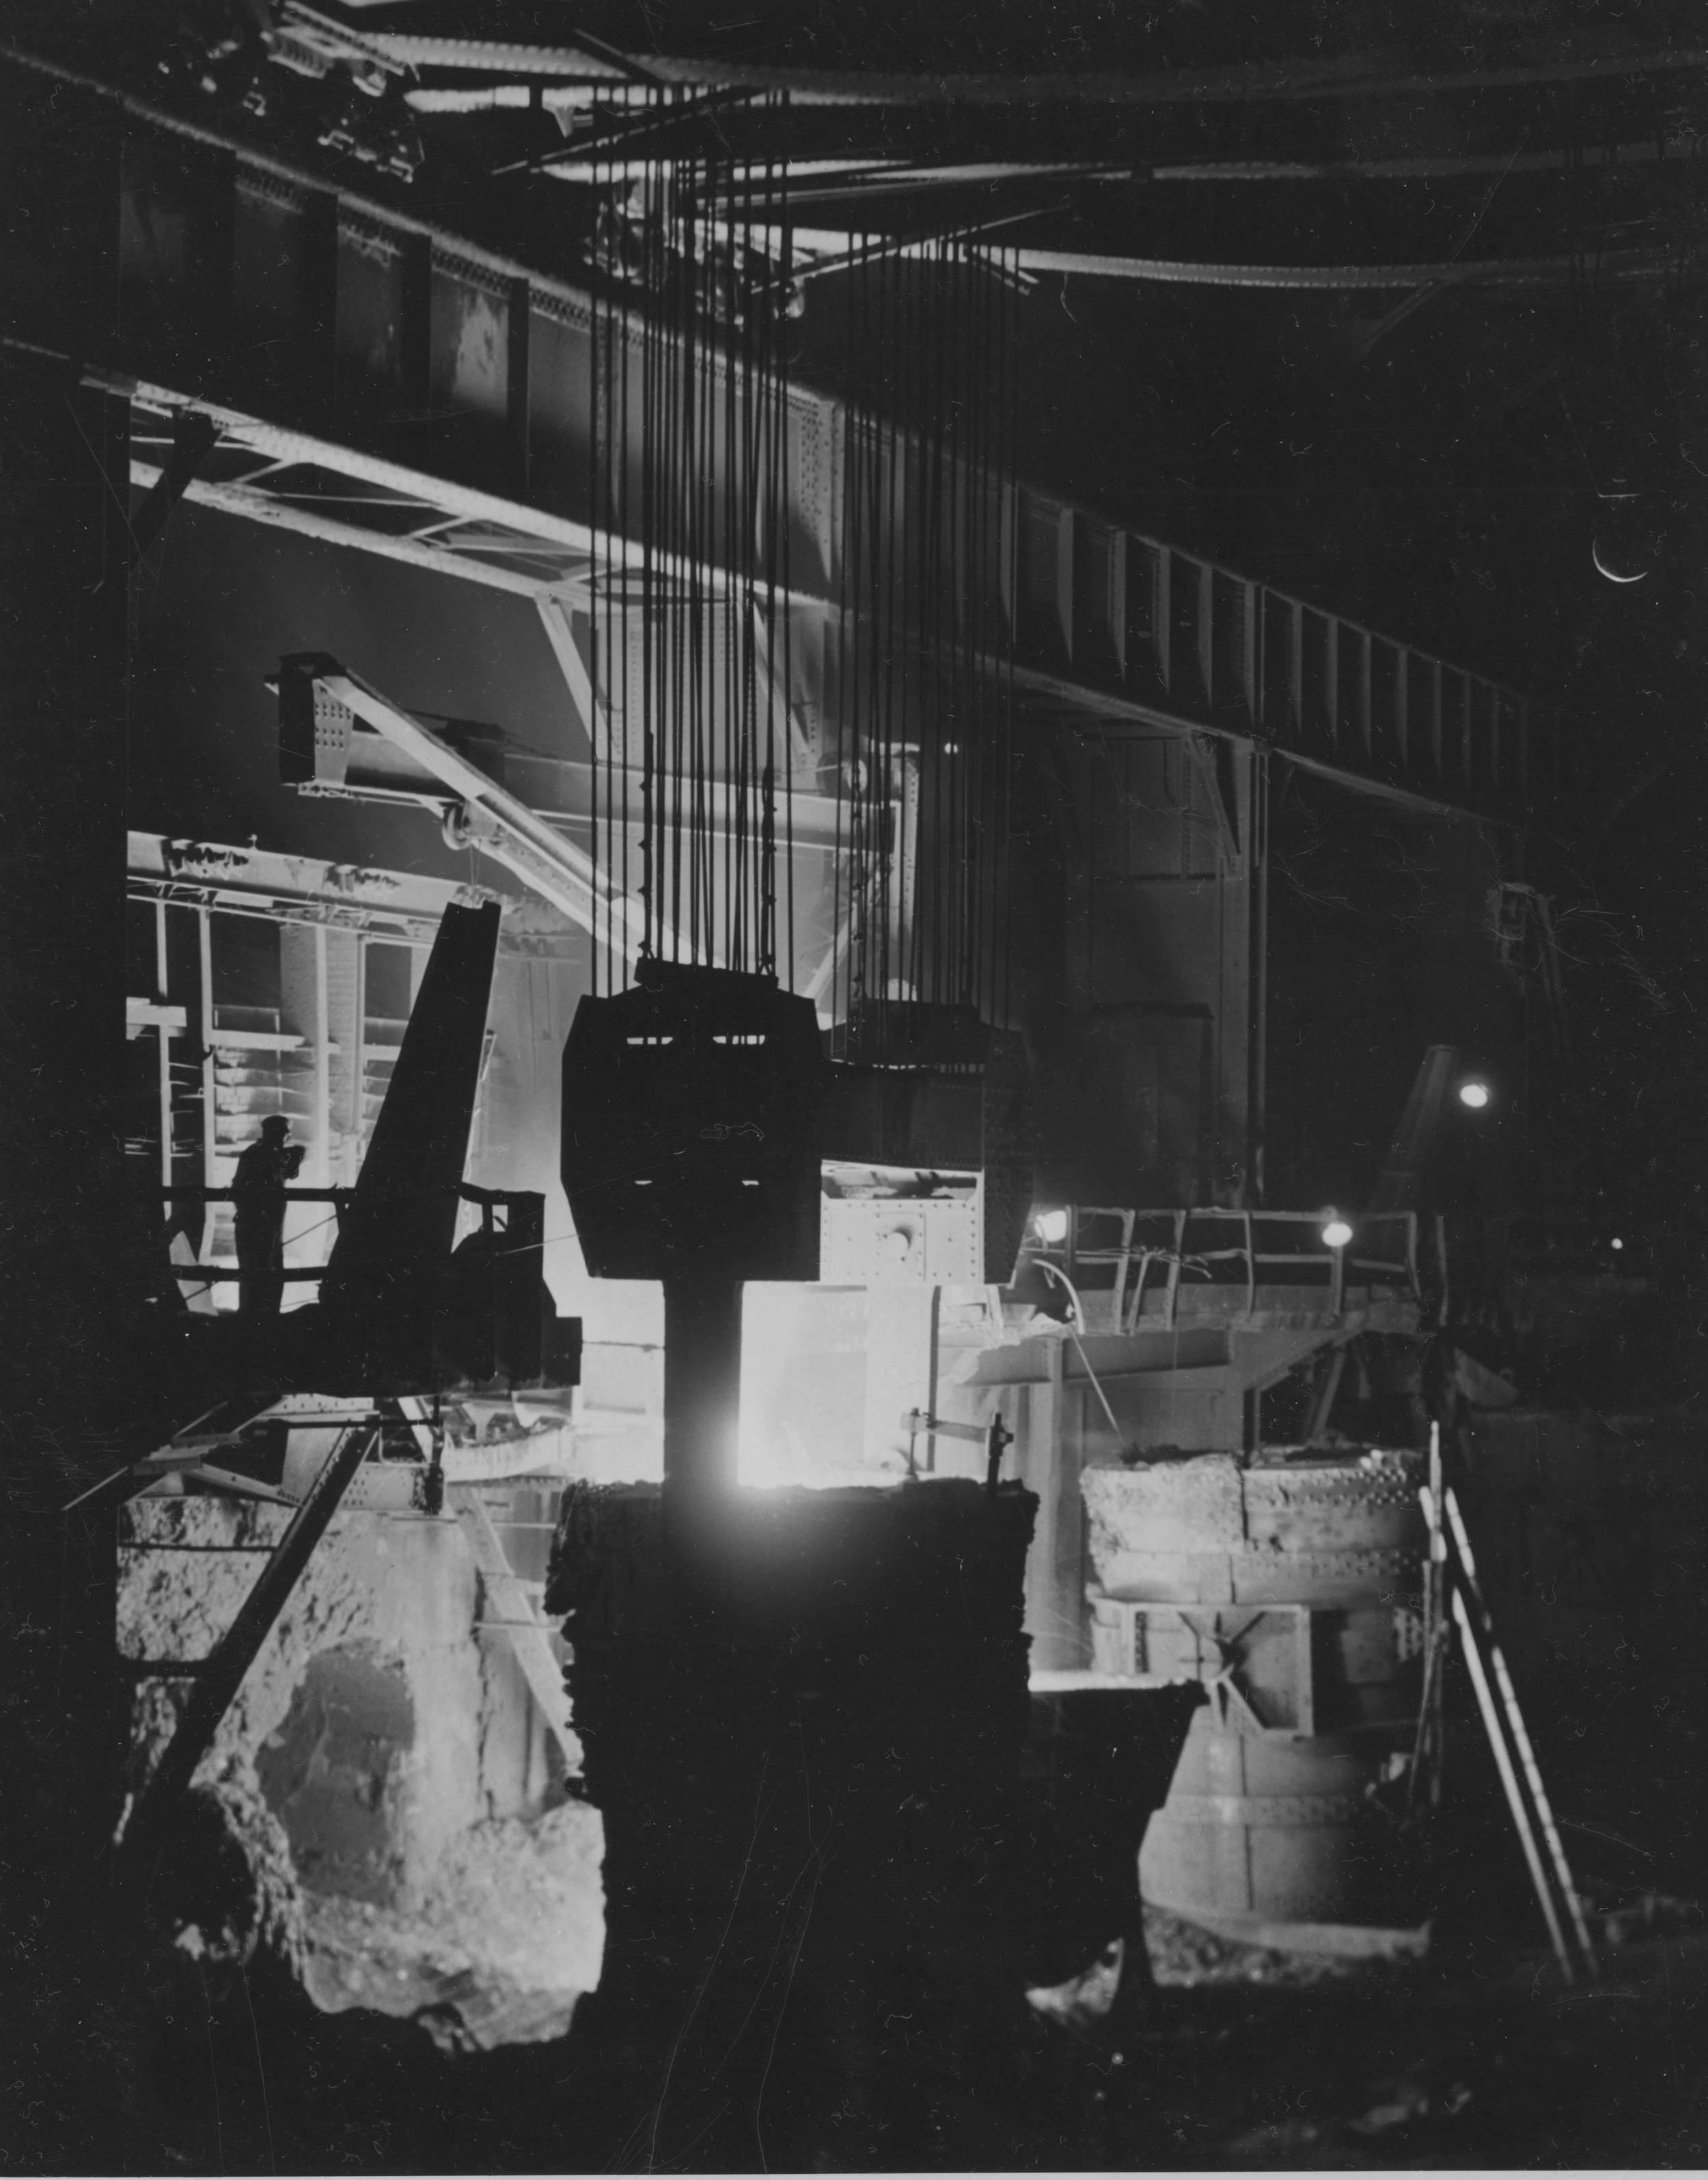 Jones_and_Laughlin_Steel_1949.jpg